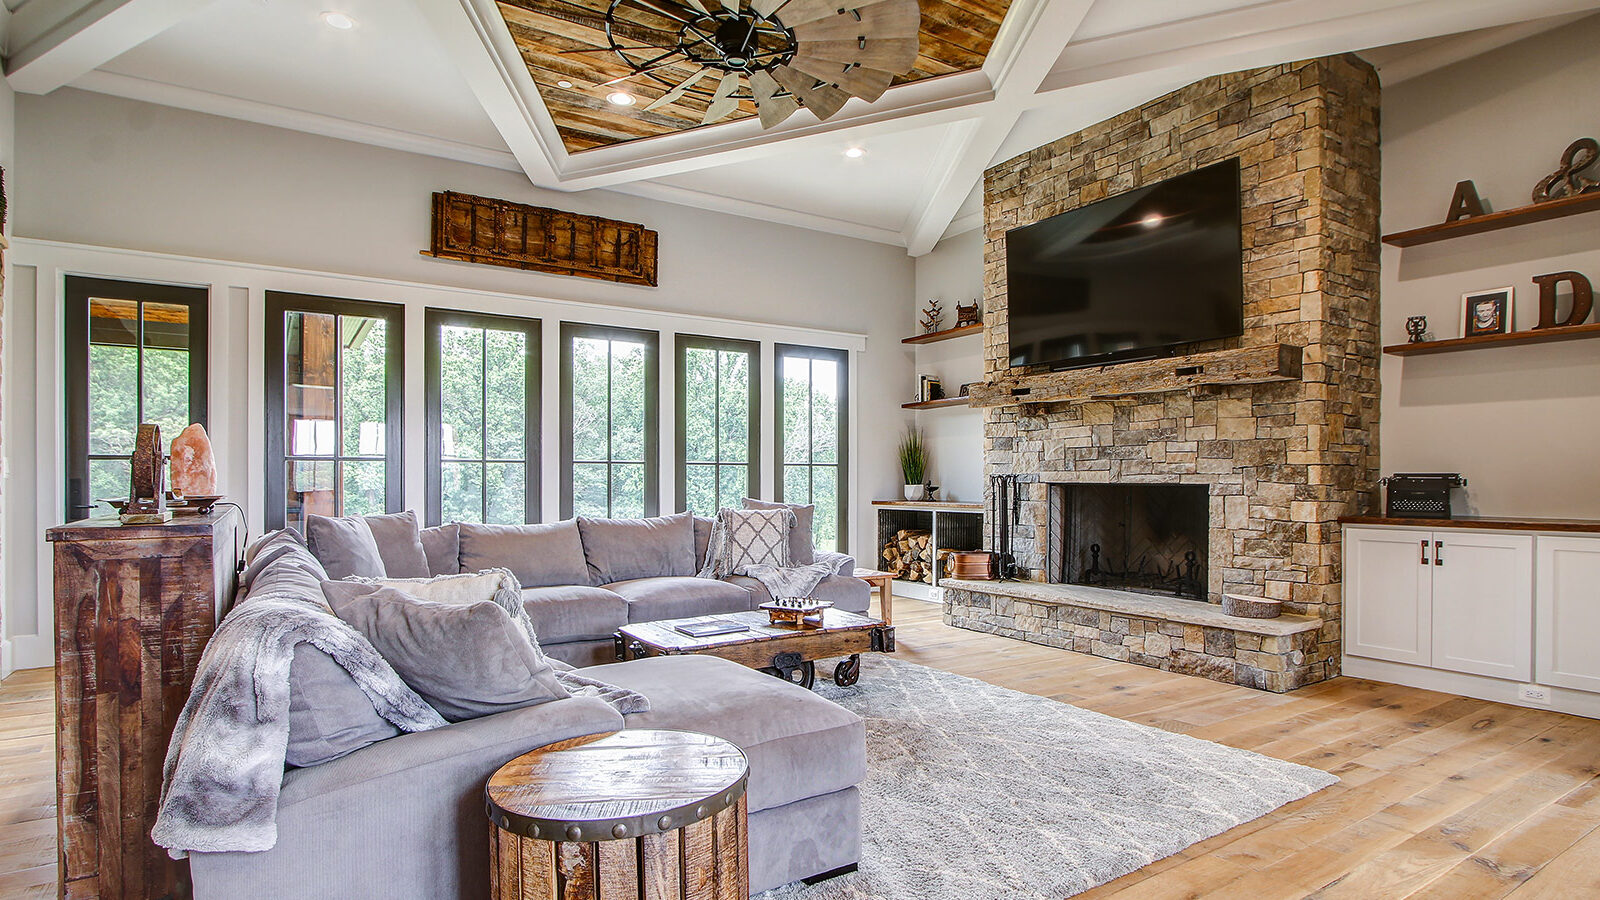 Custom built home by Ambition Custom Homes